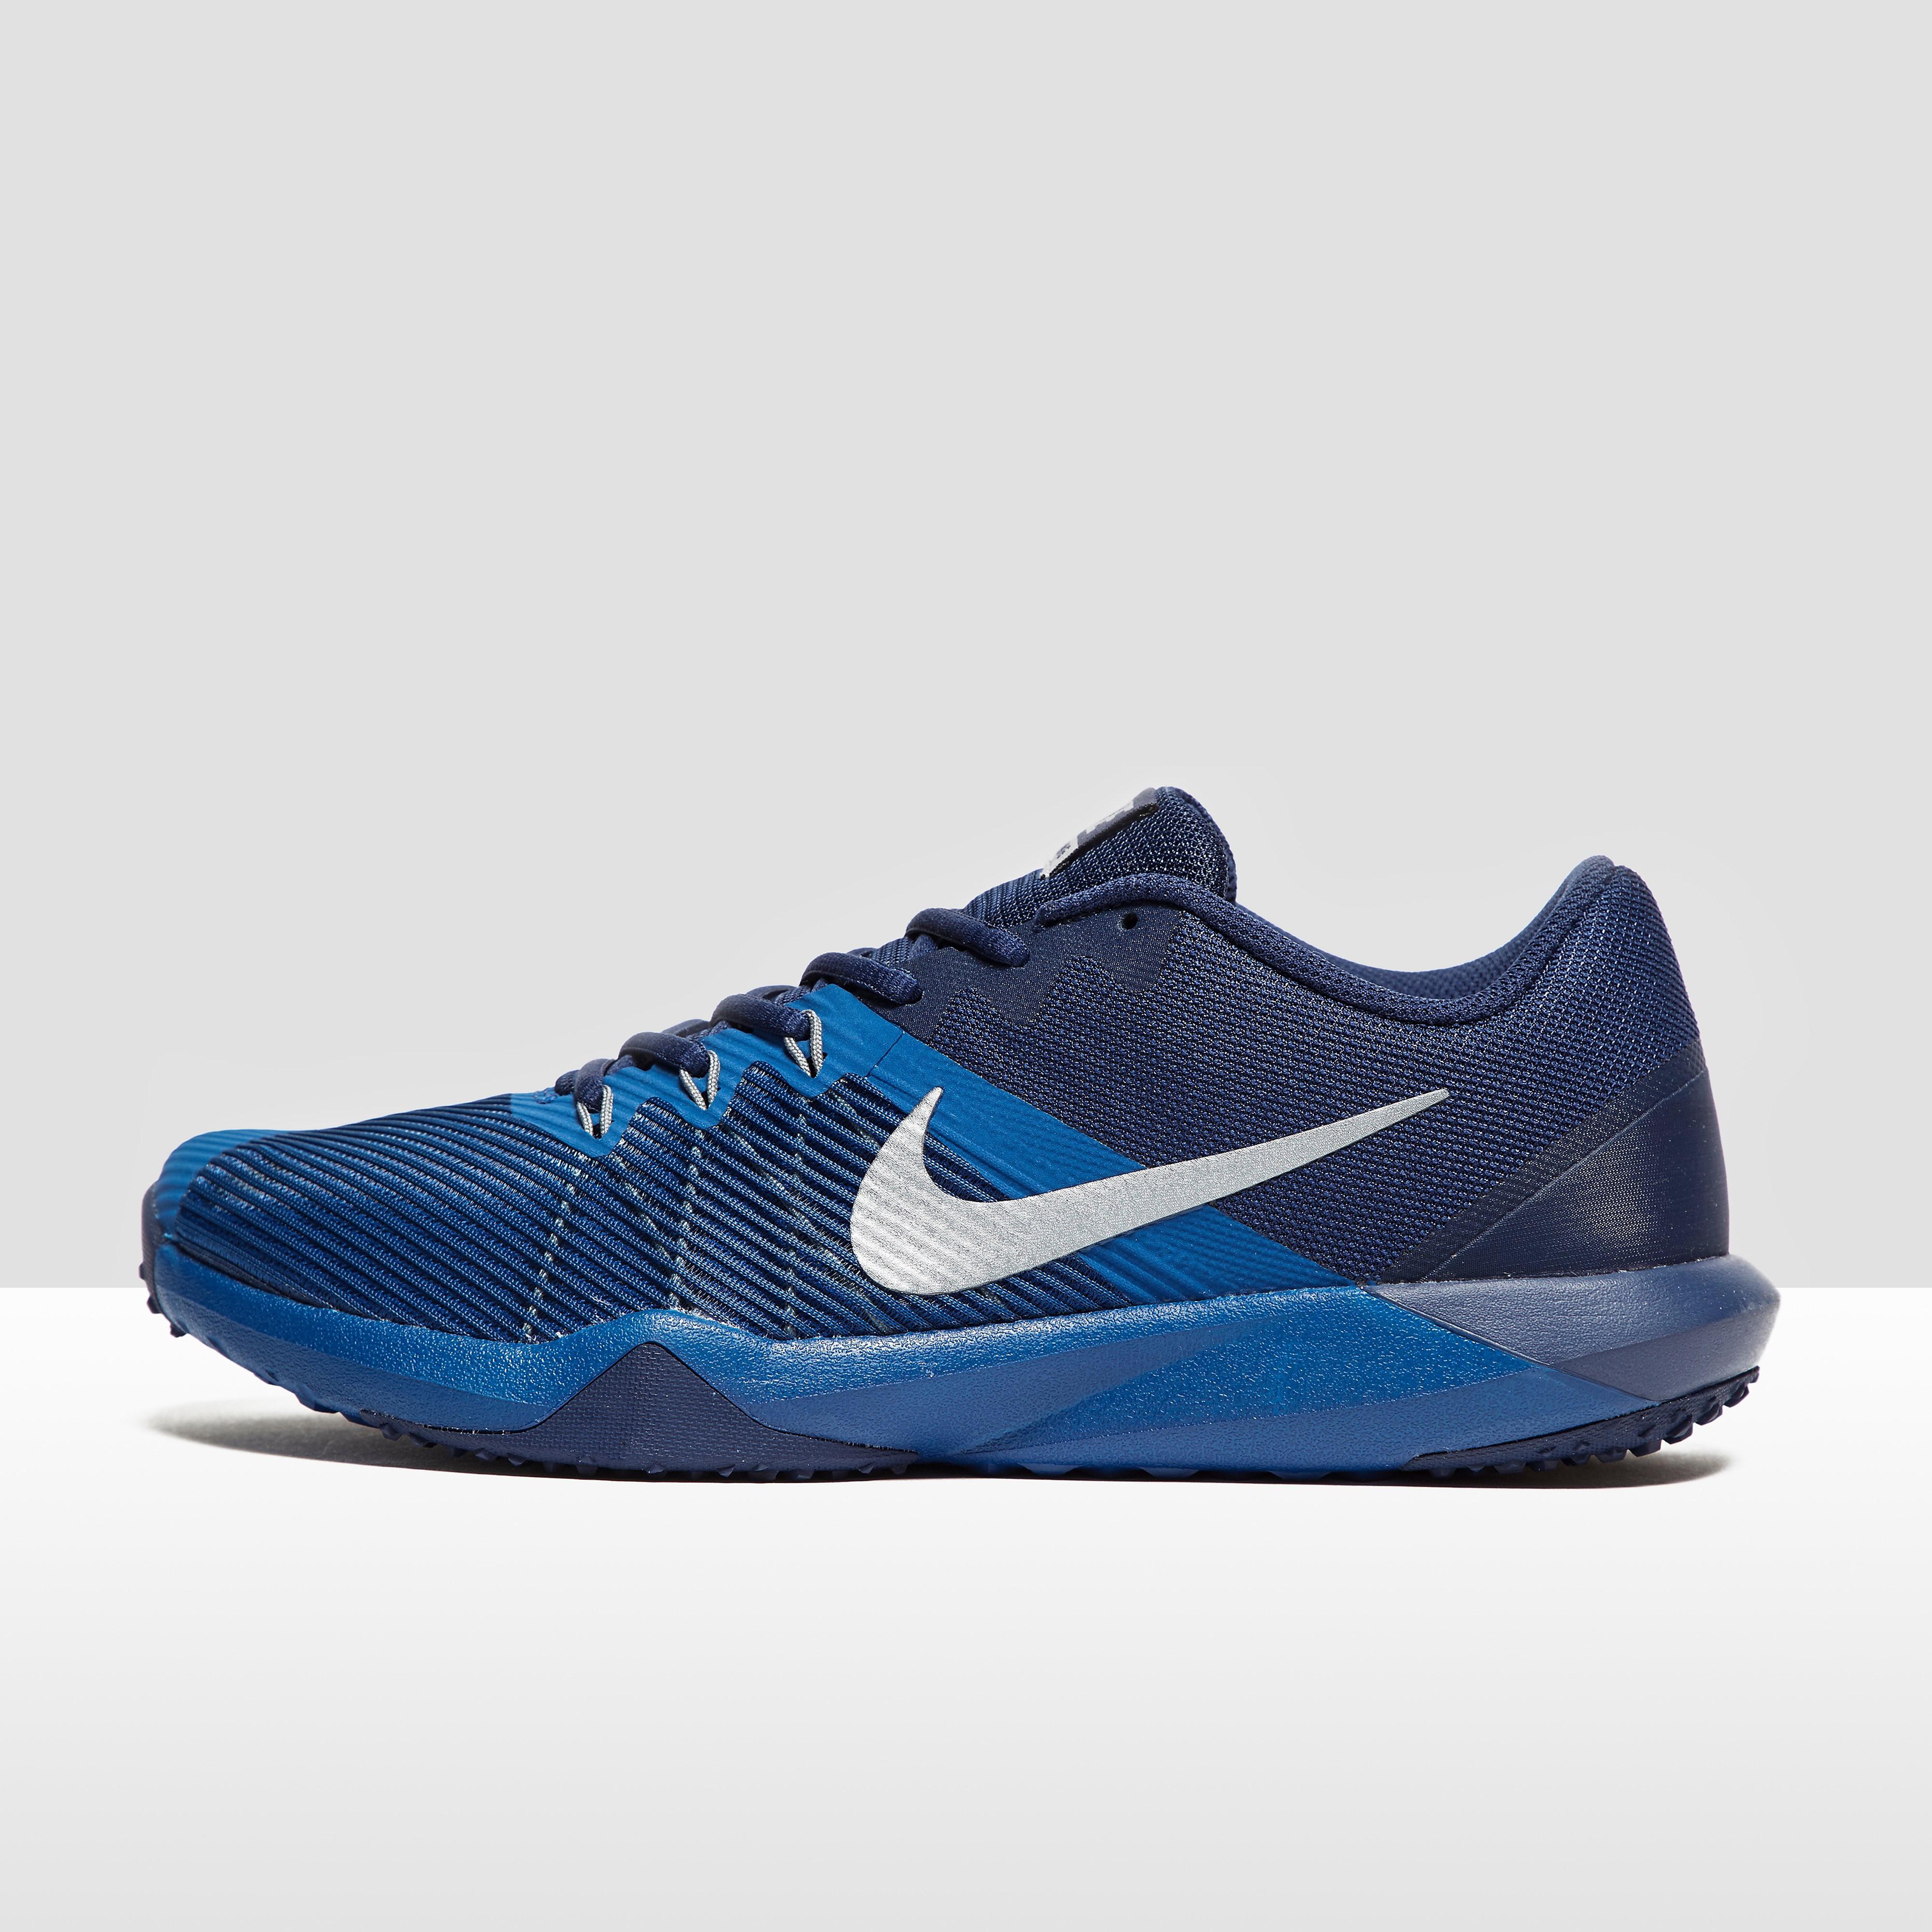 Nike Retaliation TR Men's Training Shoes